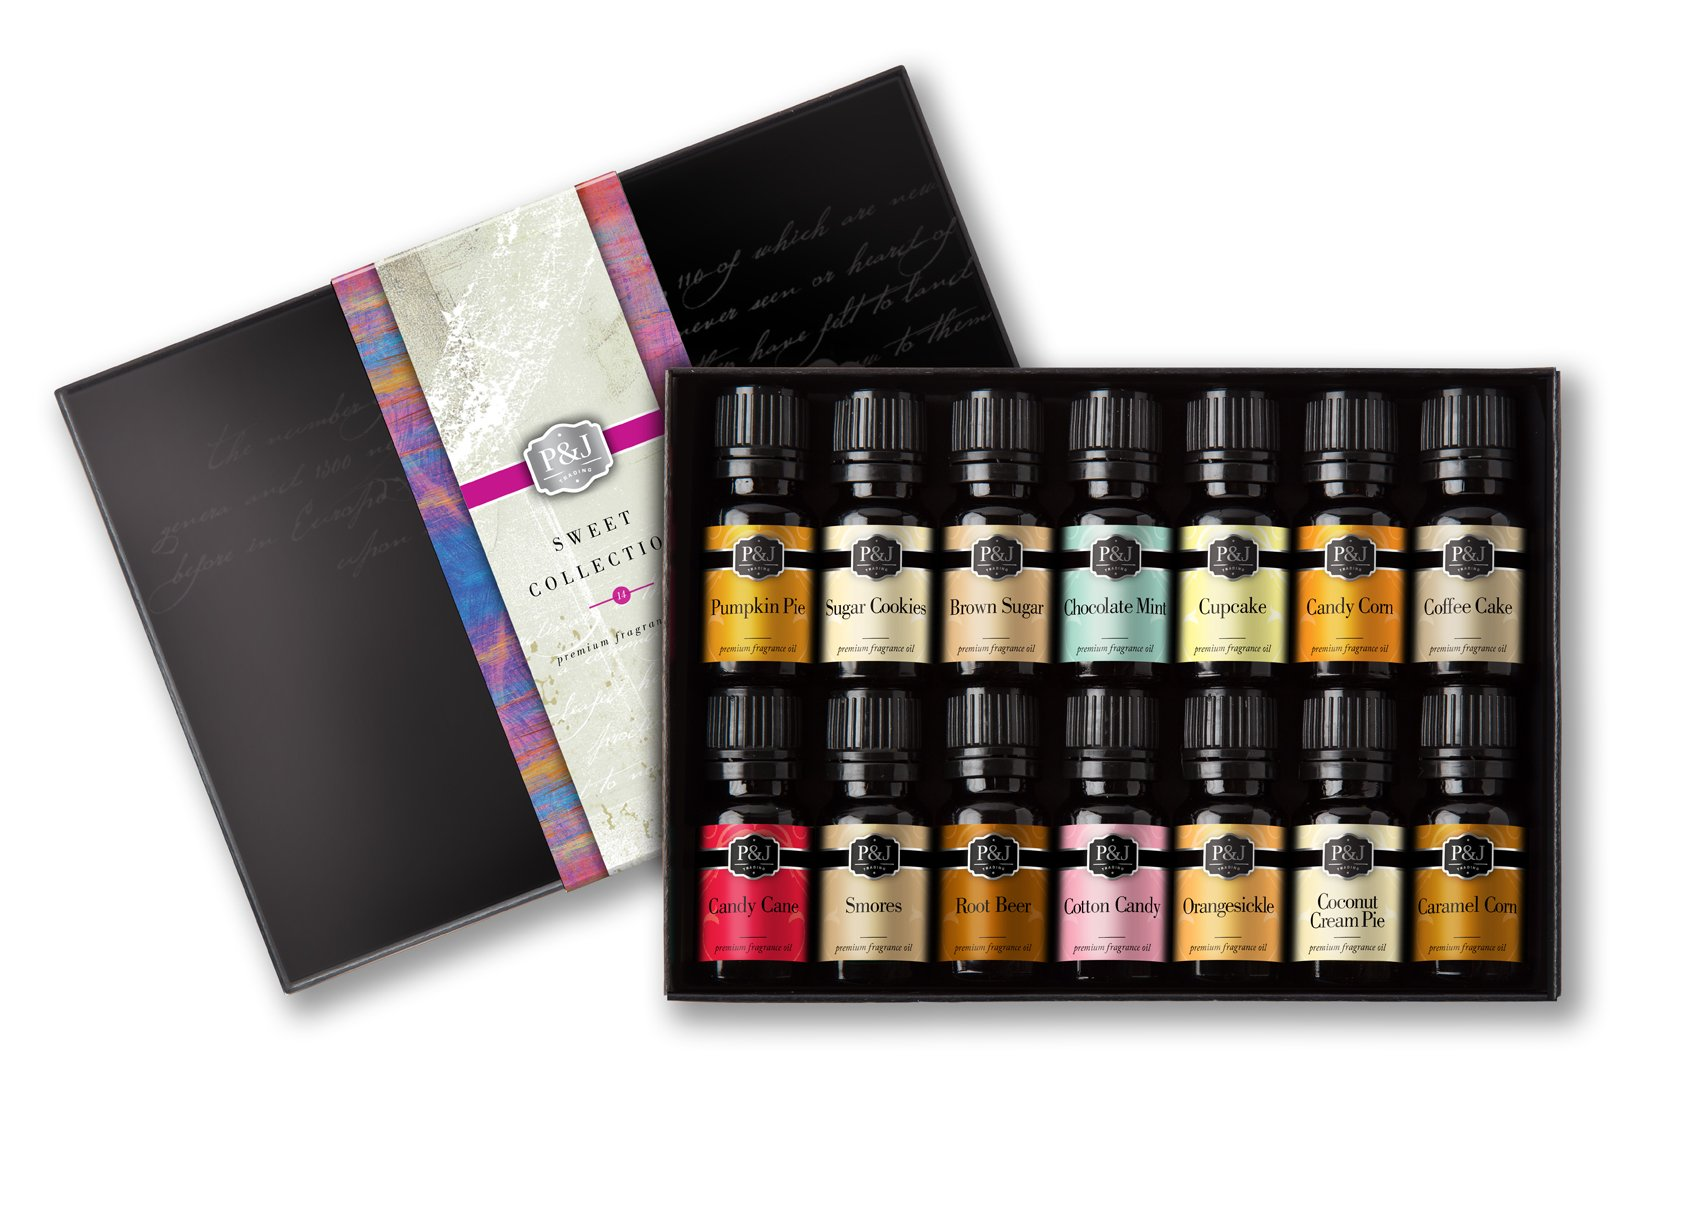 Sweet Set of 14 Premium Grade Fragrance Oils - 10ml by P&J Trading